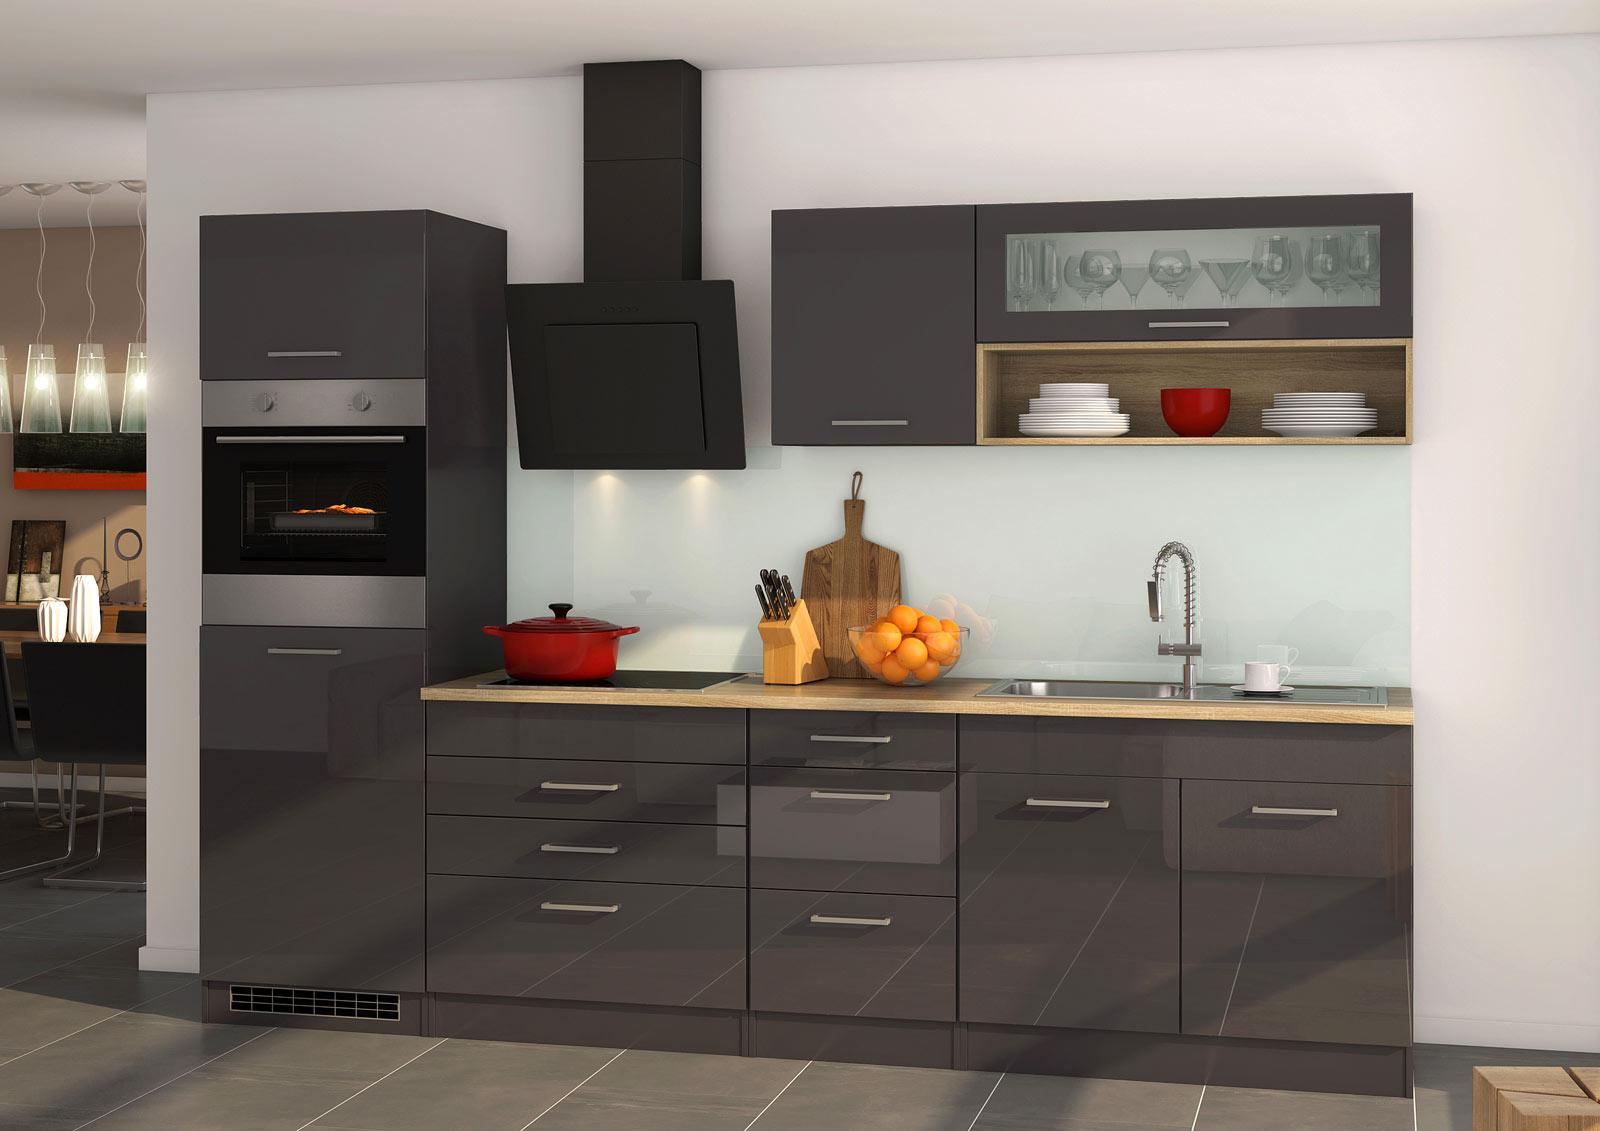 Lifestyle4Living Küchenblock, grau Hochglanz, Stellmaß: ca. 290 cm, mit Elektrogeräten